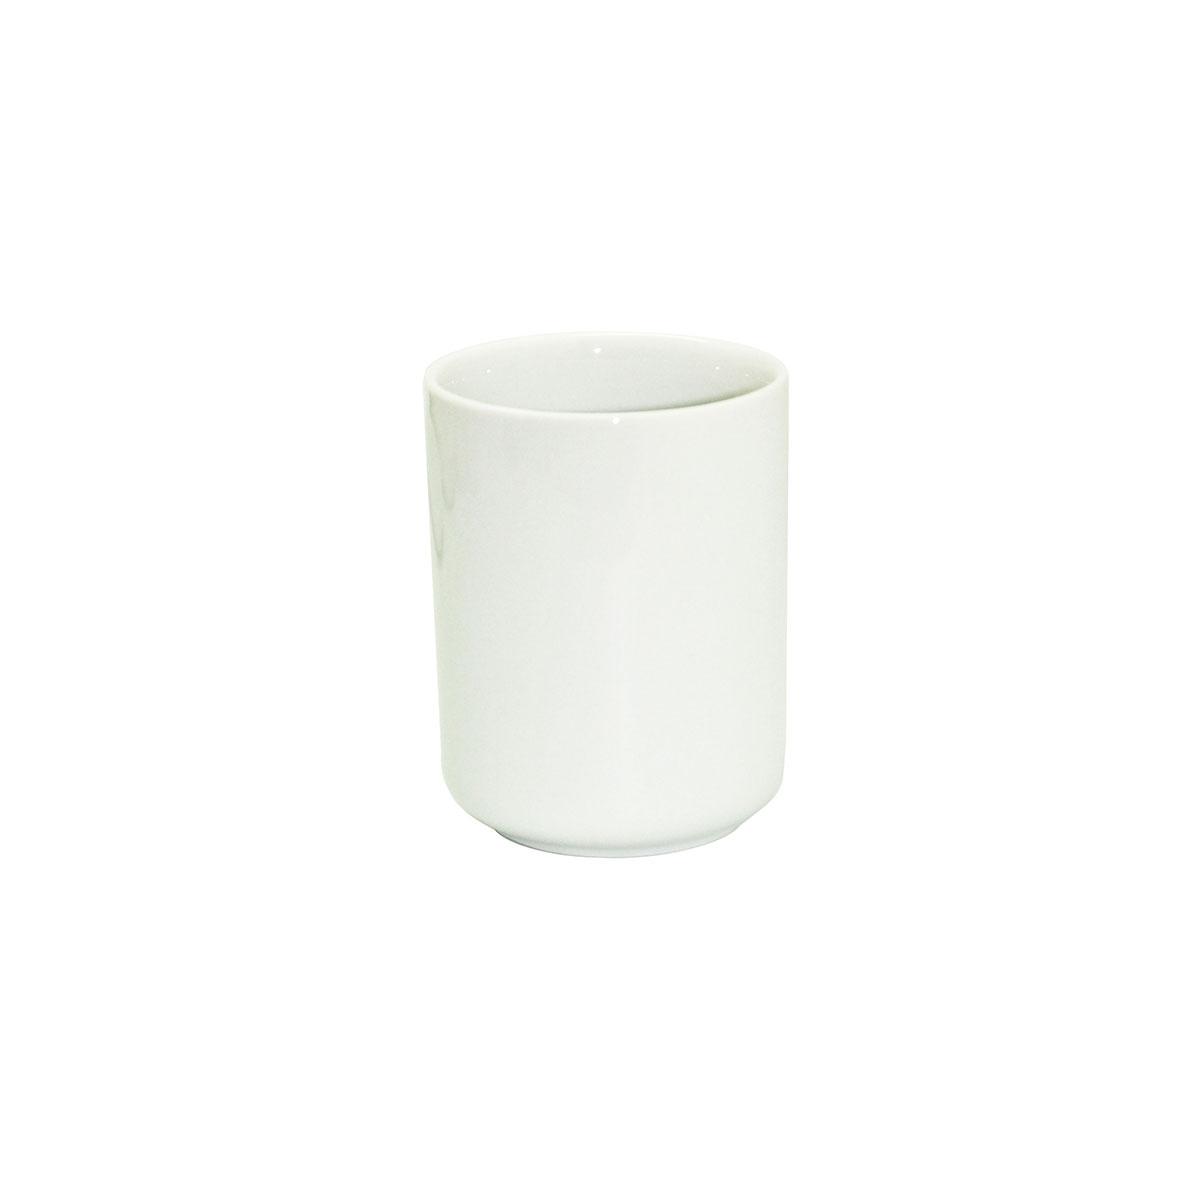 Gobelet en porcelaine (Blanc)